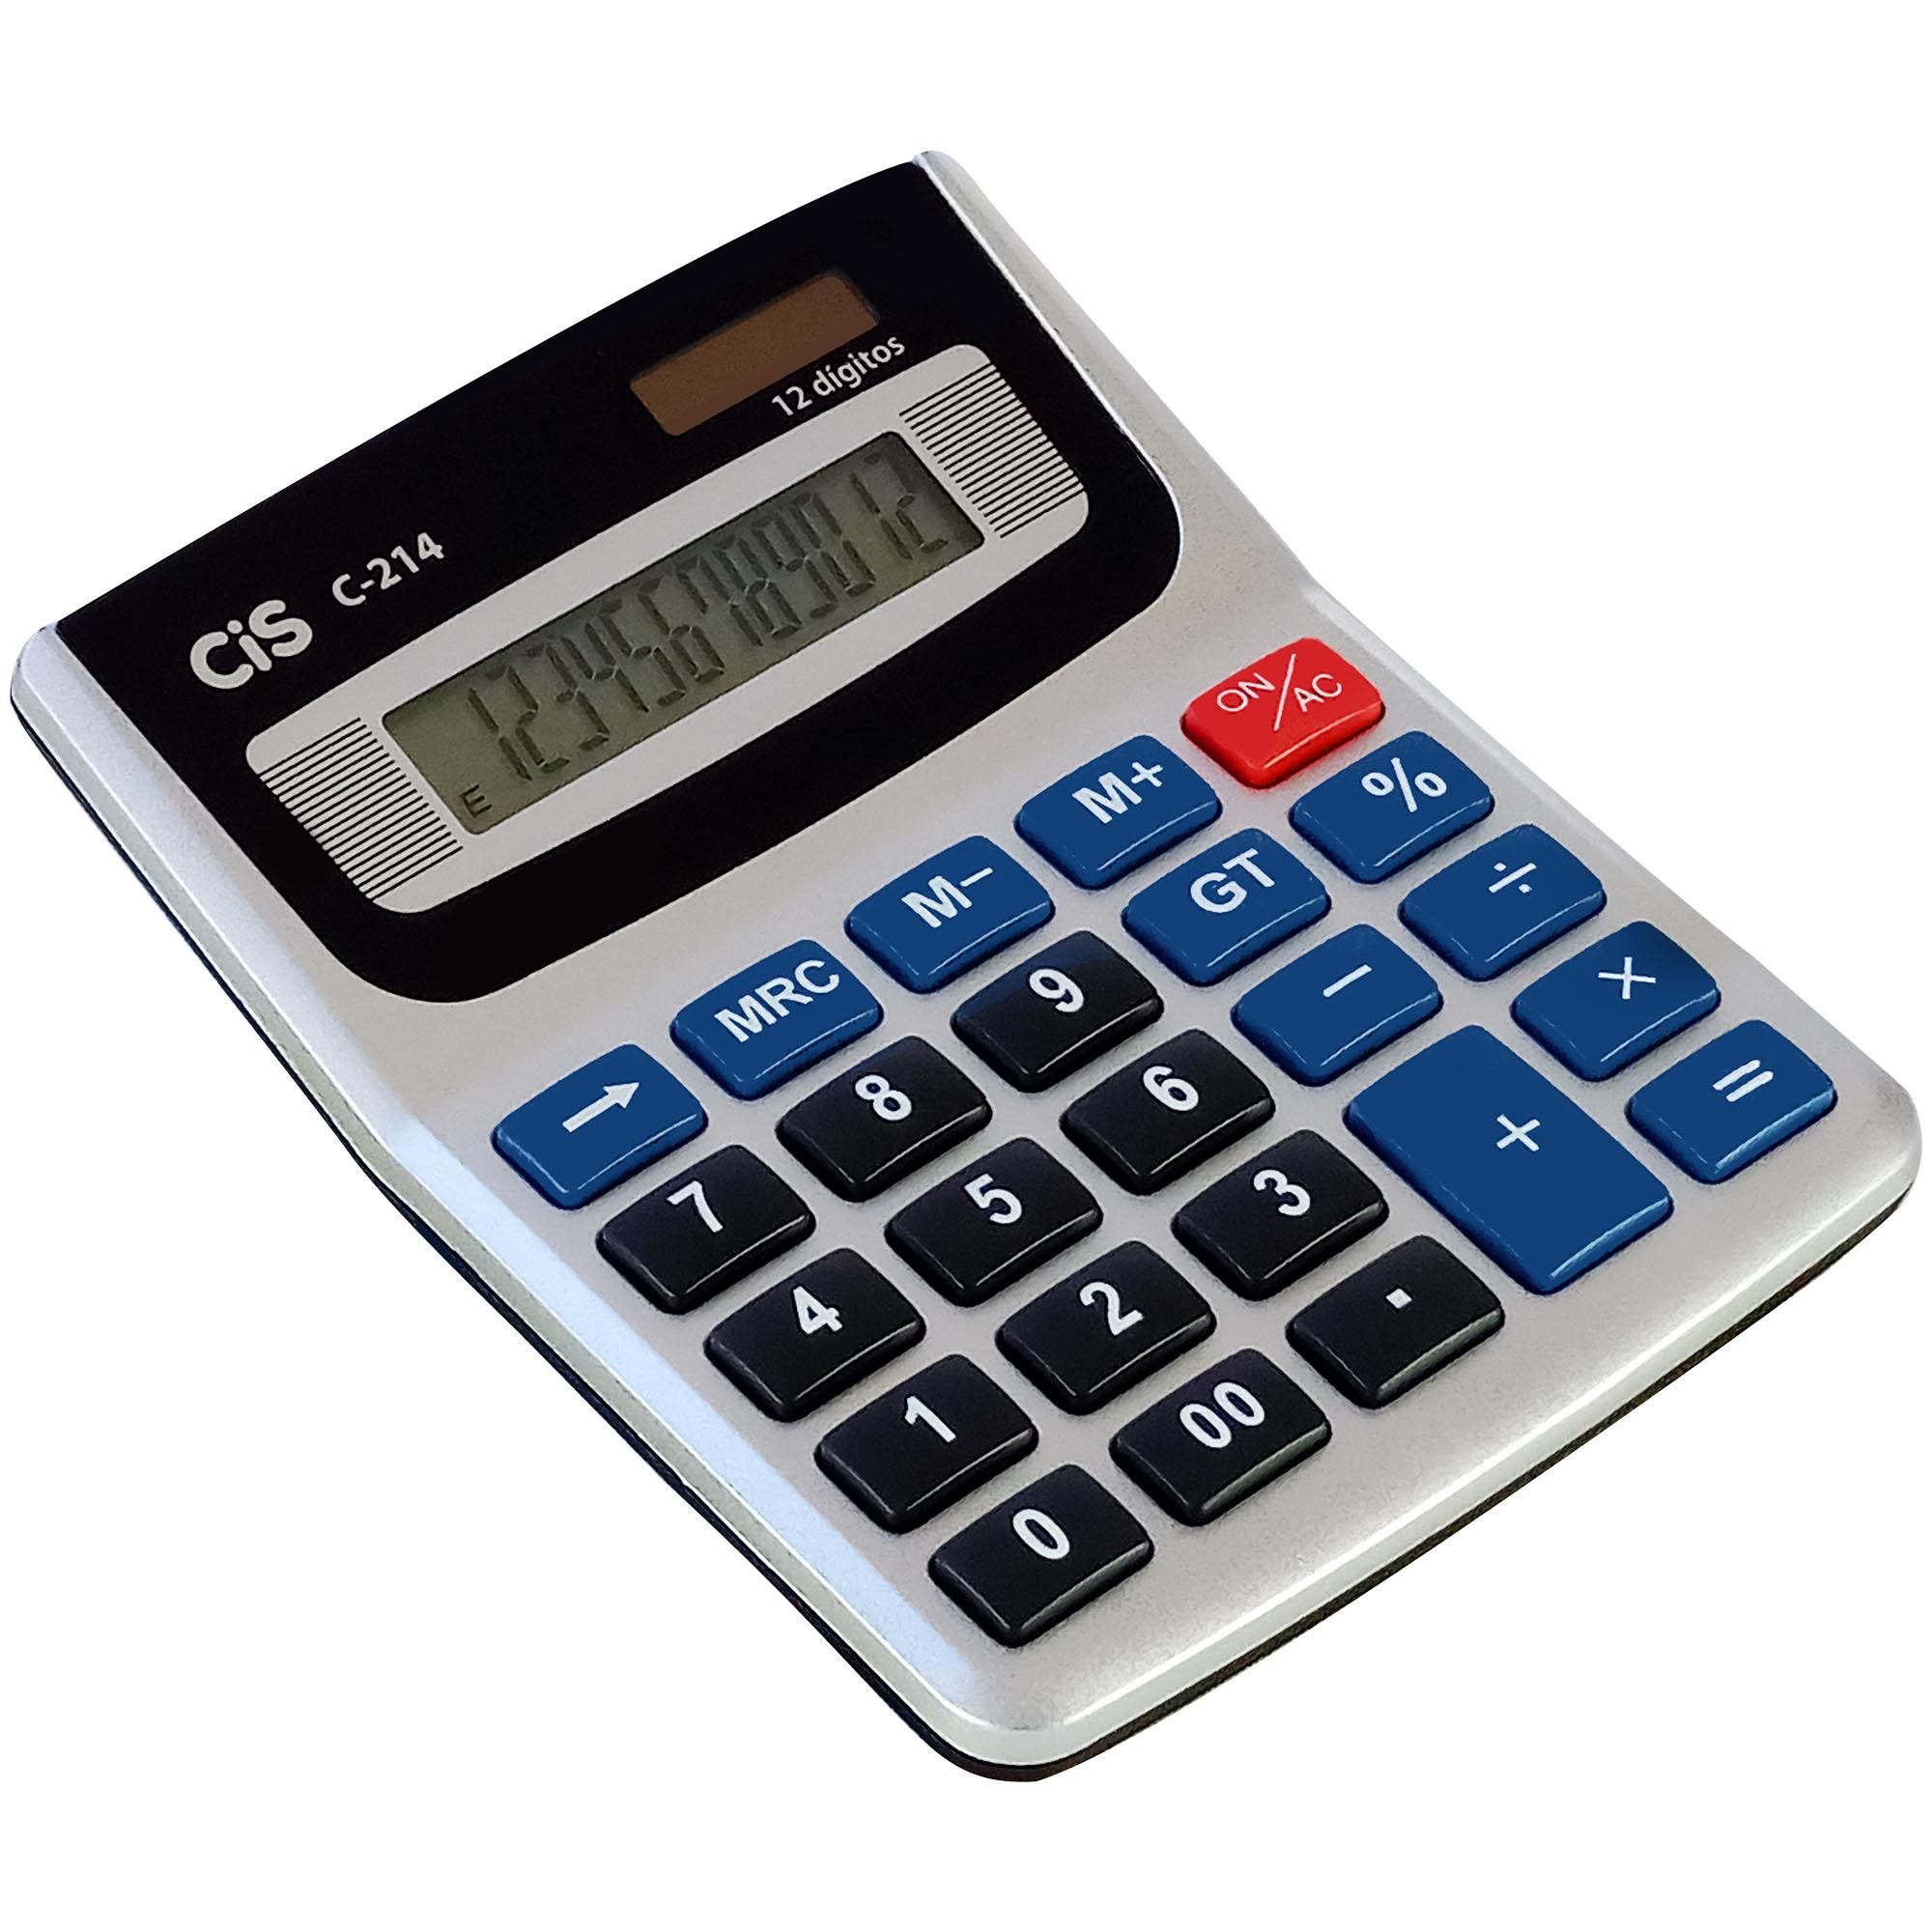 Calculadora de Mesa 12 Digitos C-214 - Cis